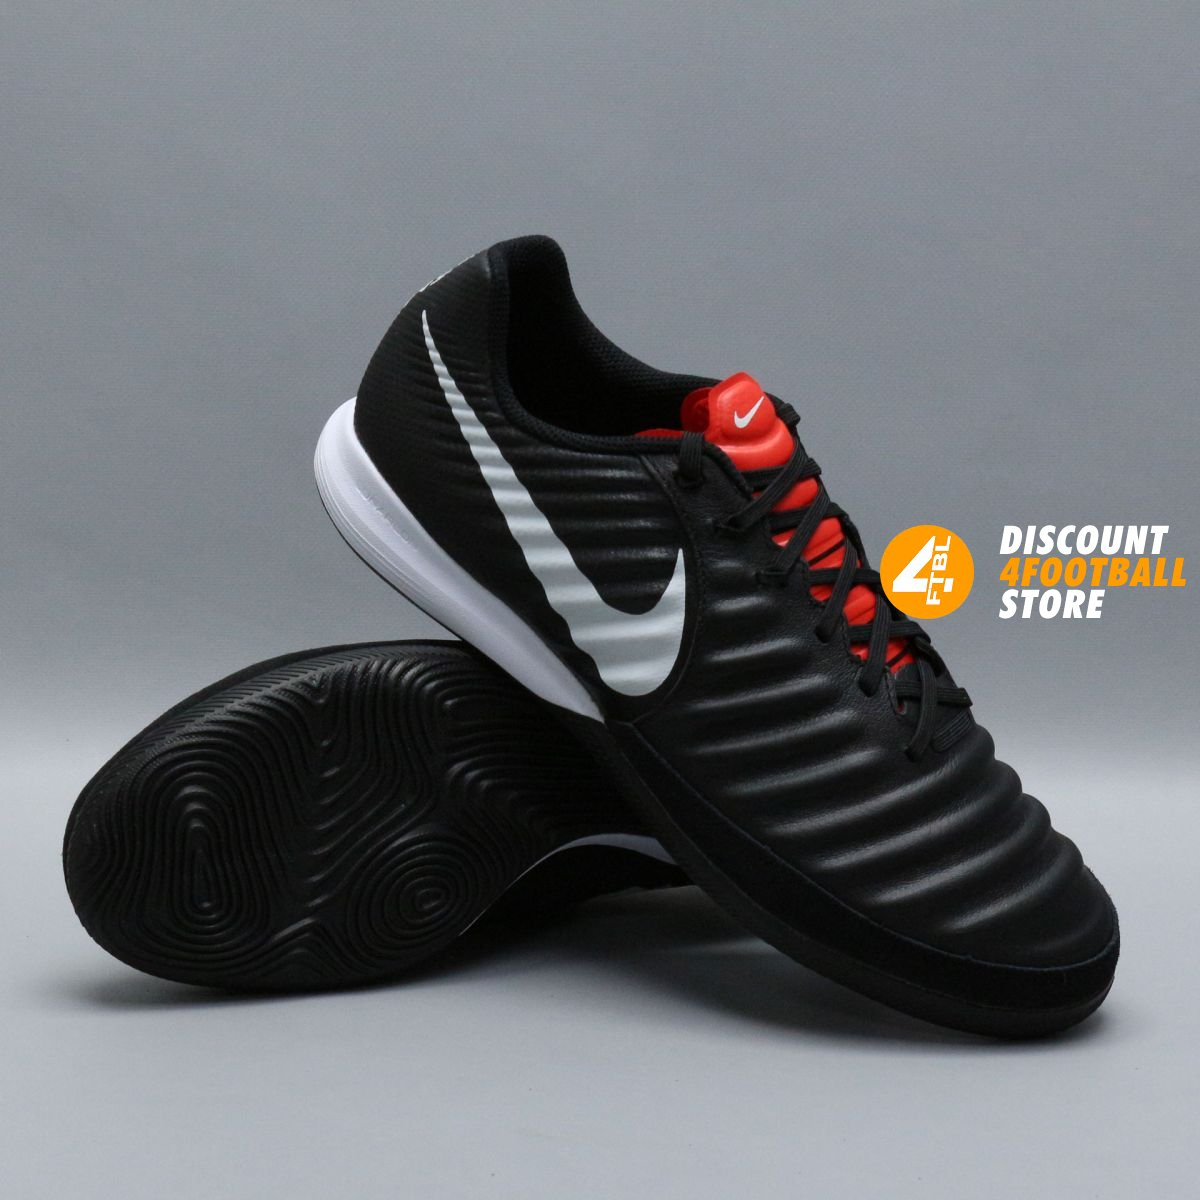 e96fcdcc Футзалки Nike Tiempo Lunar Legend Pro AH7246-006 купить на 4football ...